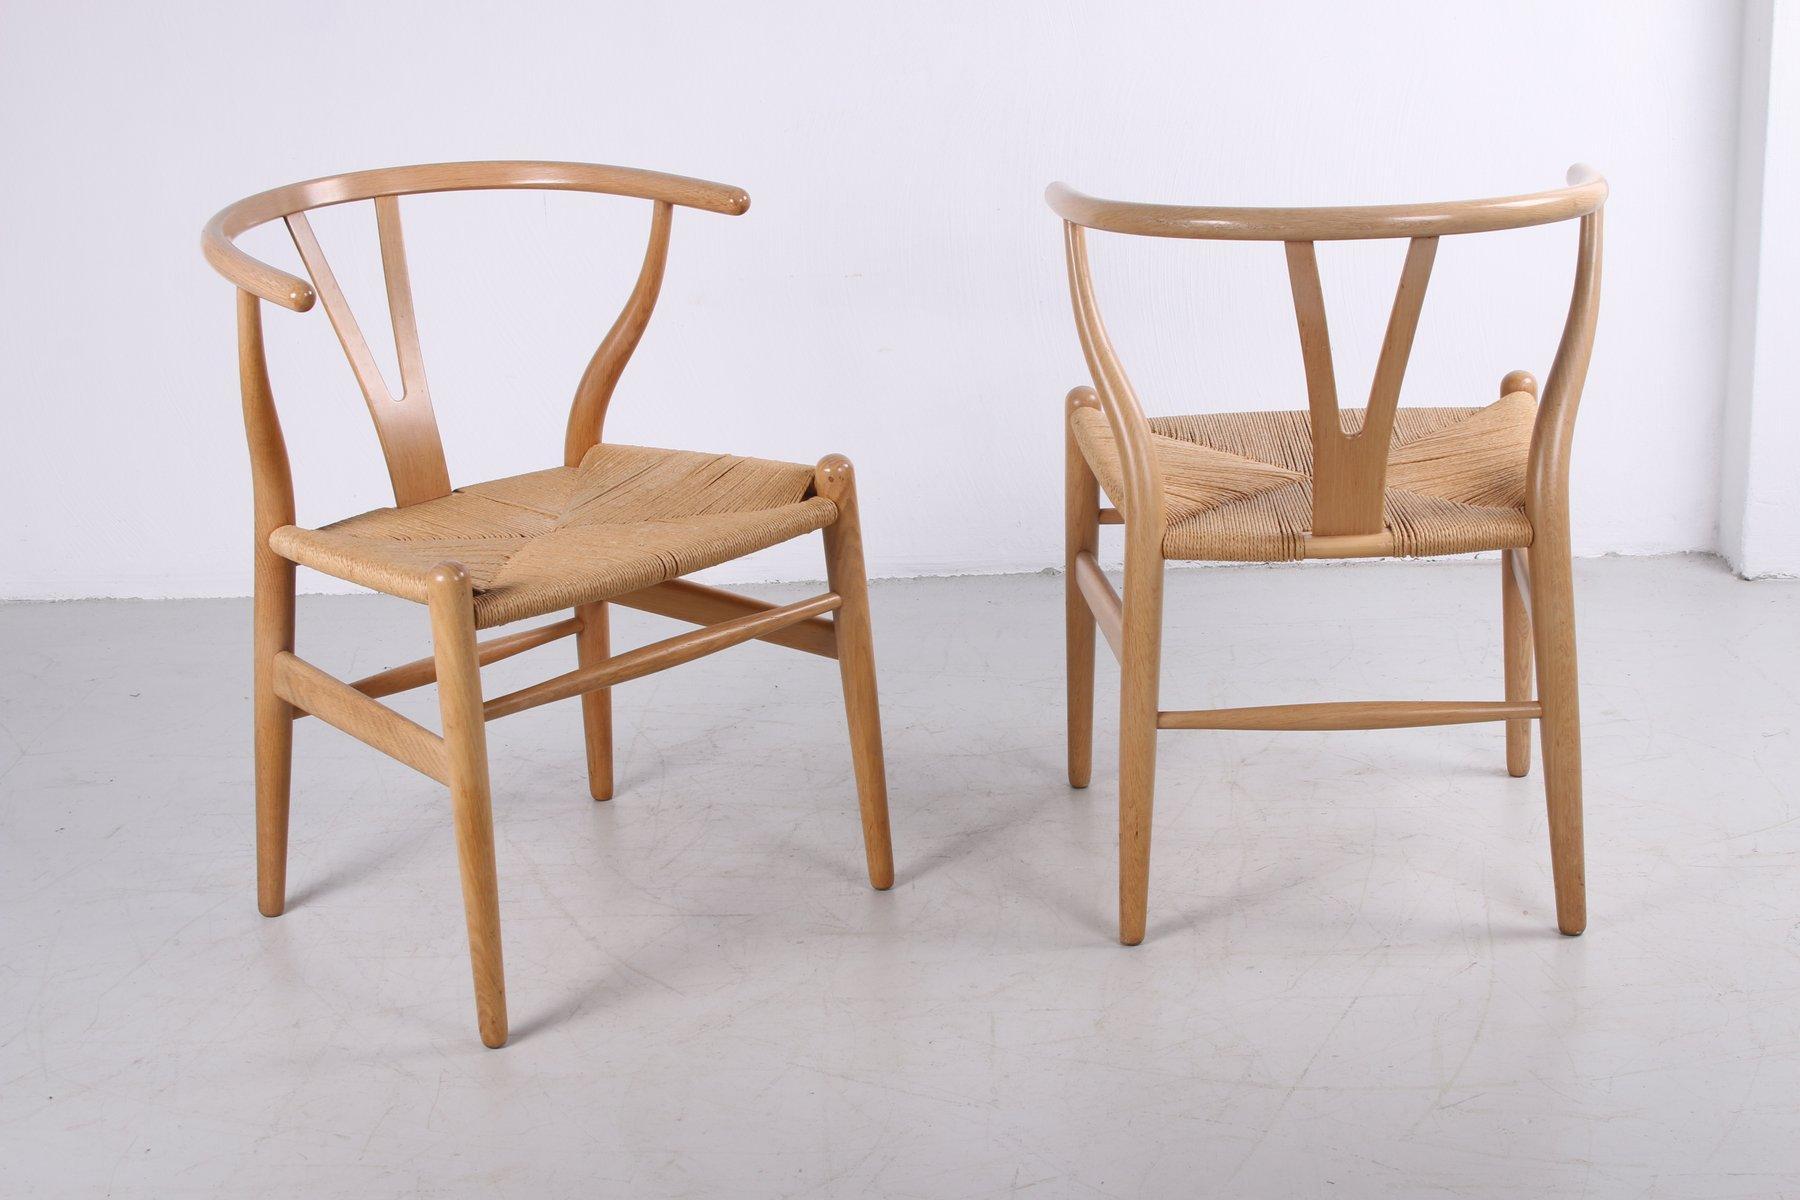 Modern Furniture CH24 Wishbone Dining Chairs by Hans J. Wegner for Carl Hansen 1